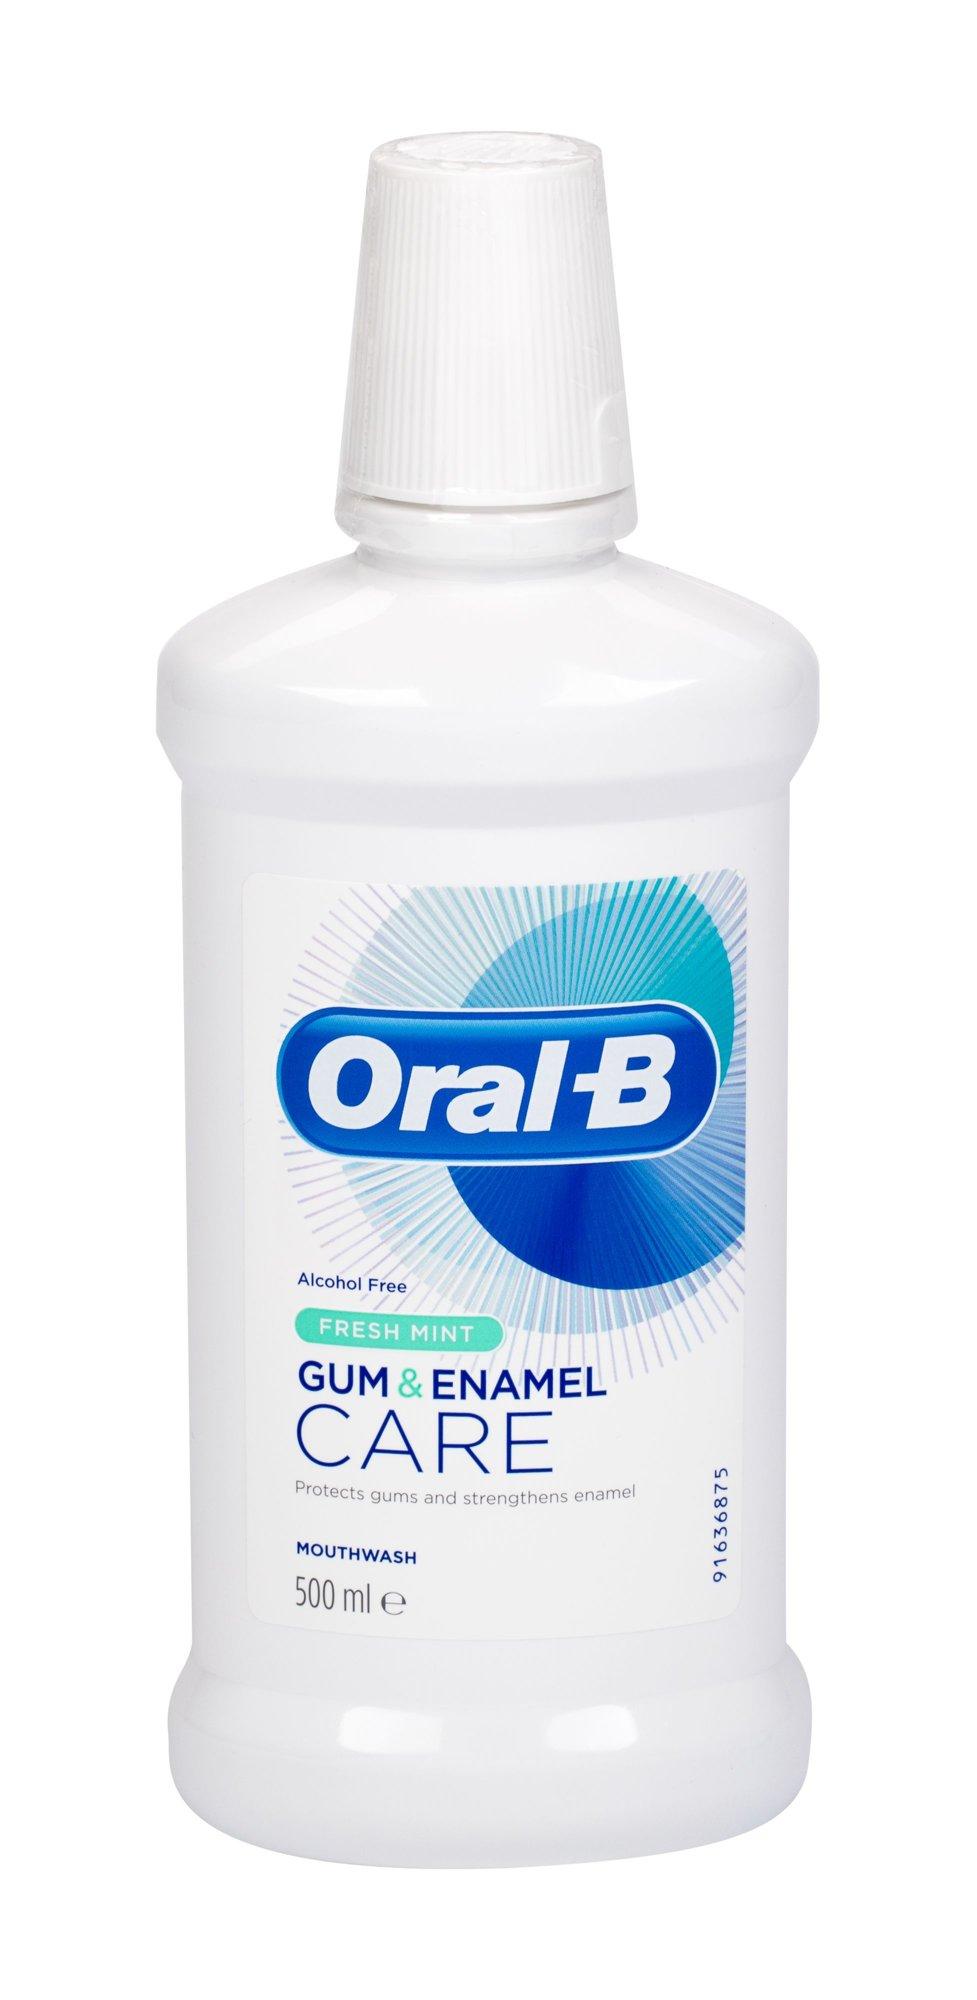 Oral-B Gum & Enamel Care Mouthwash 500ml